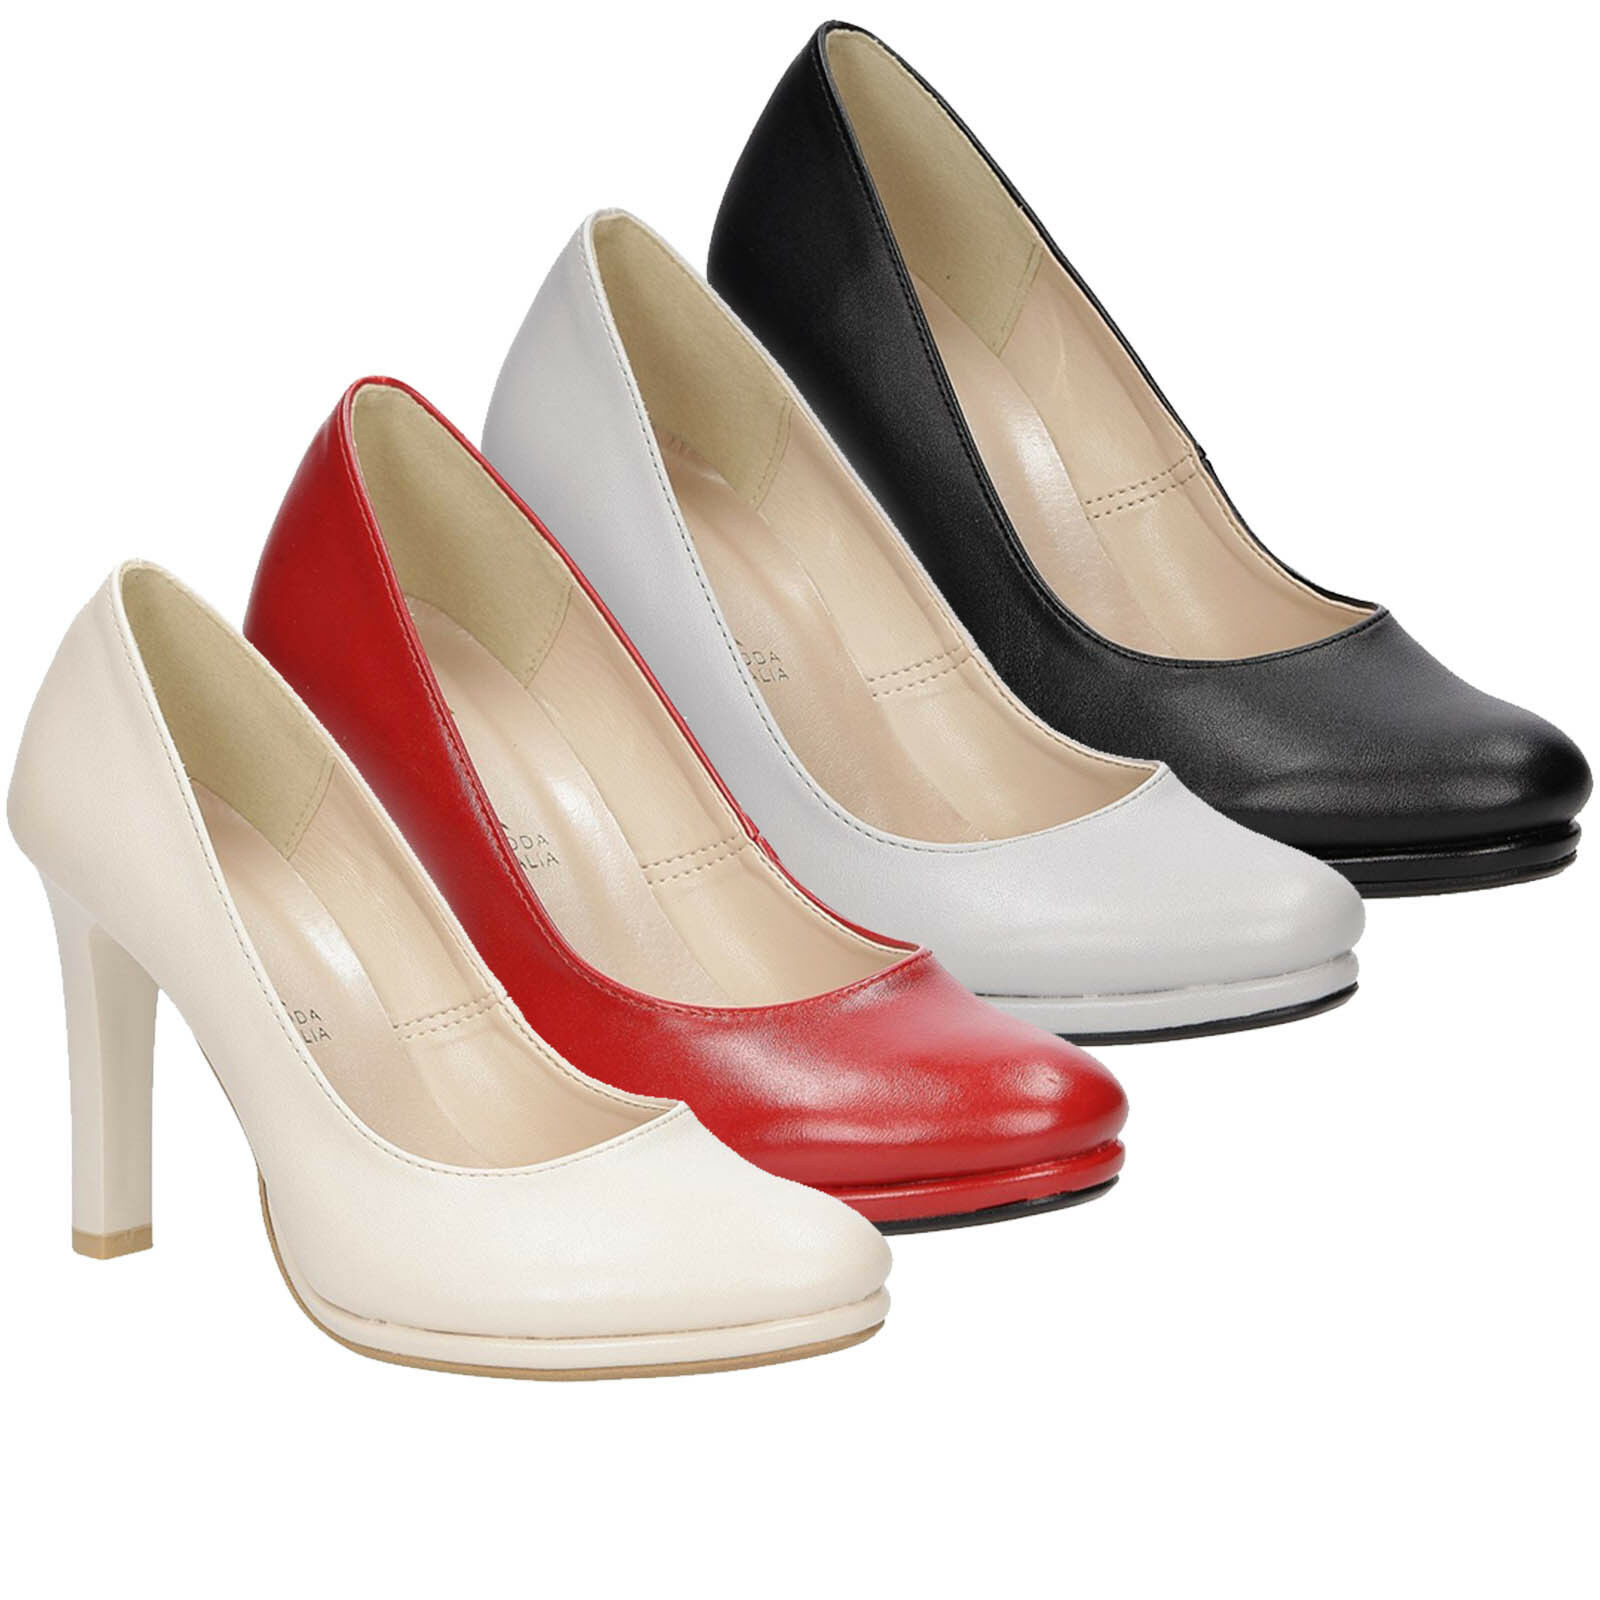 Damen Pumps Blockabsatz Elegant Modisch High Heels Komfortable Gr. 34-43 NEU